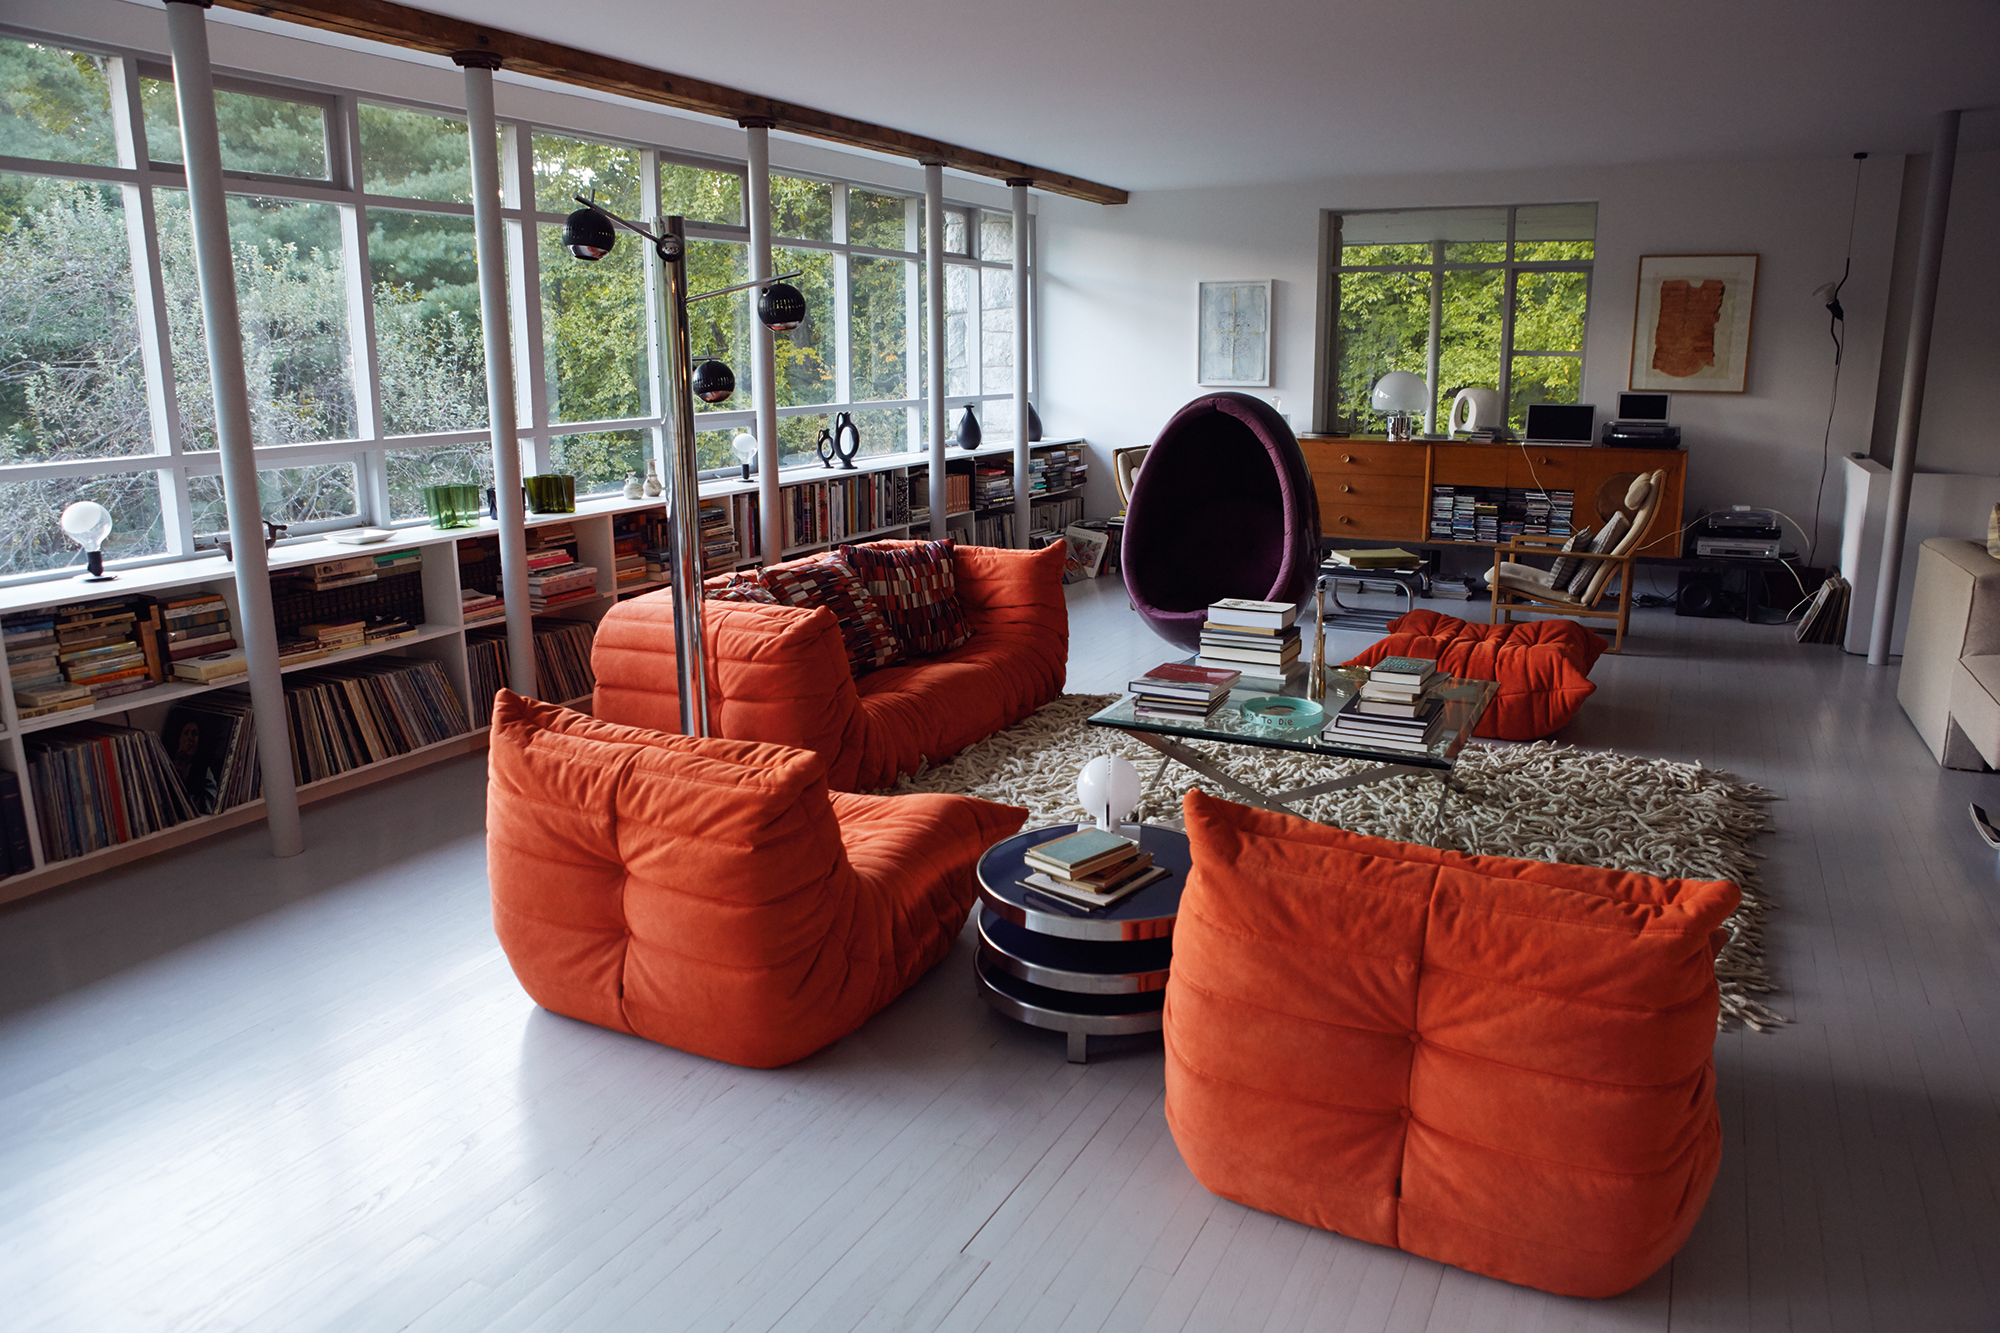 Ligne Roset's Togo designed by Michel Ducaroy in 1973, copy of Arne Jacobson Egg chair.